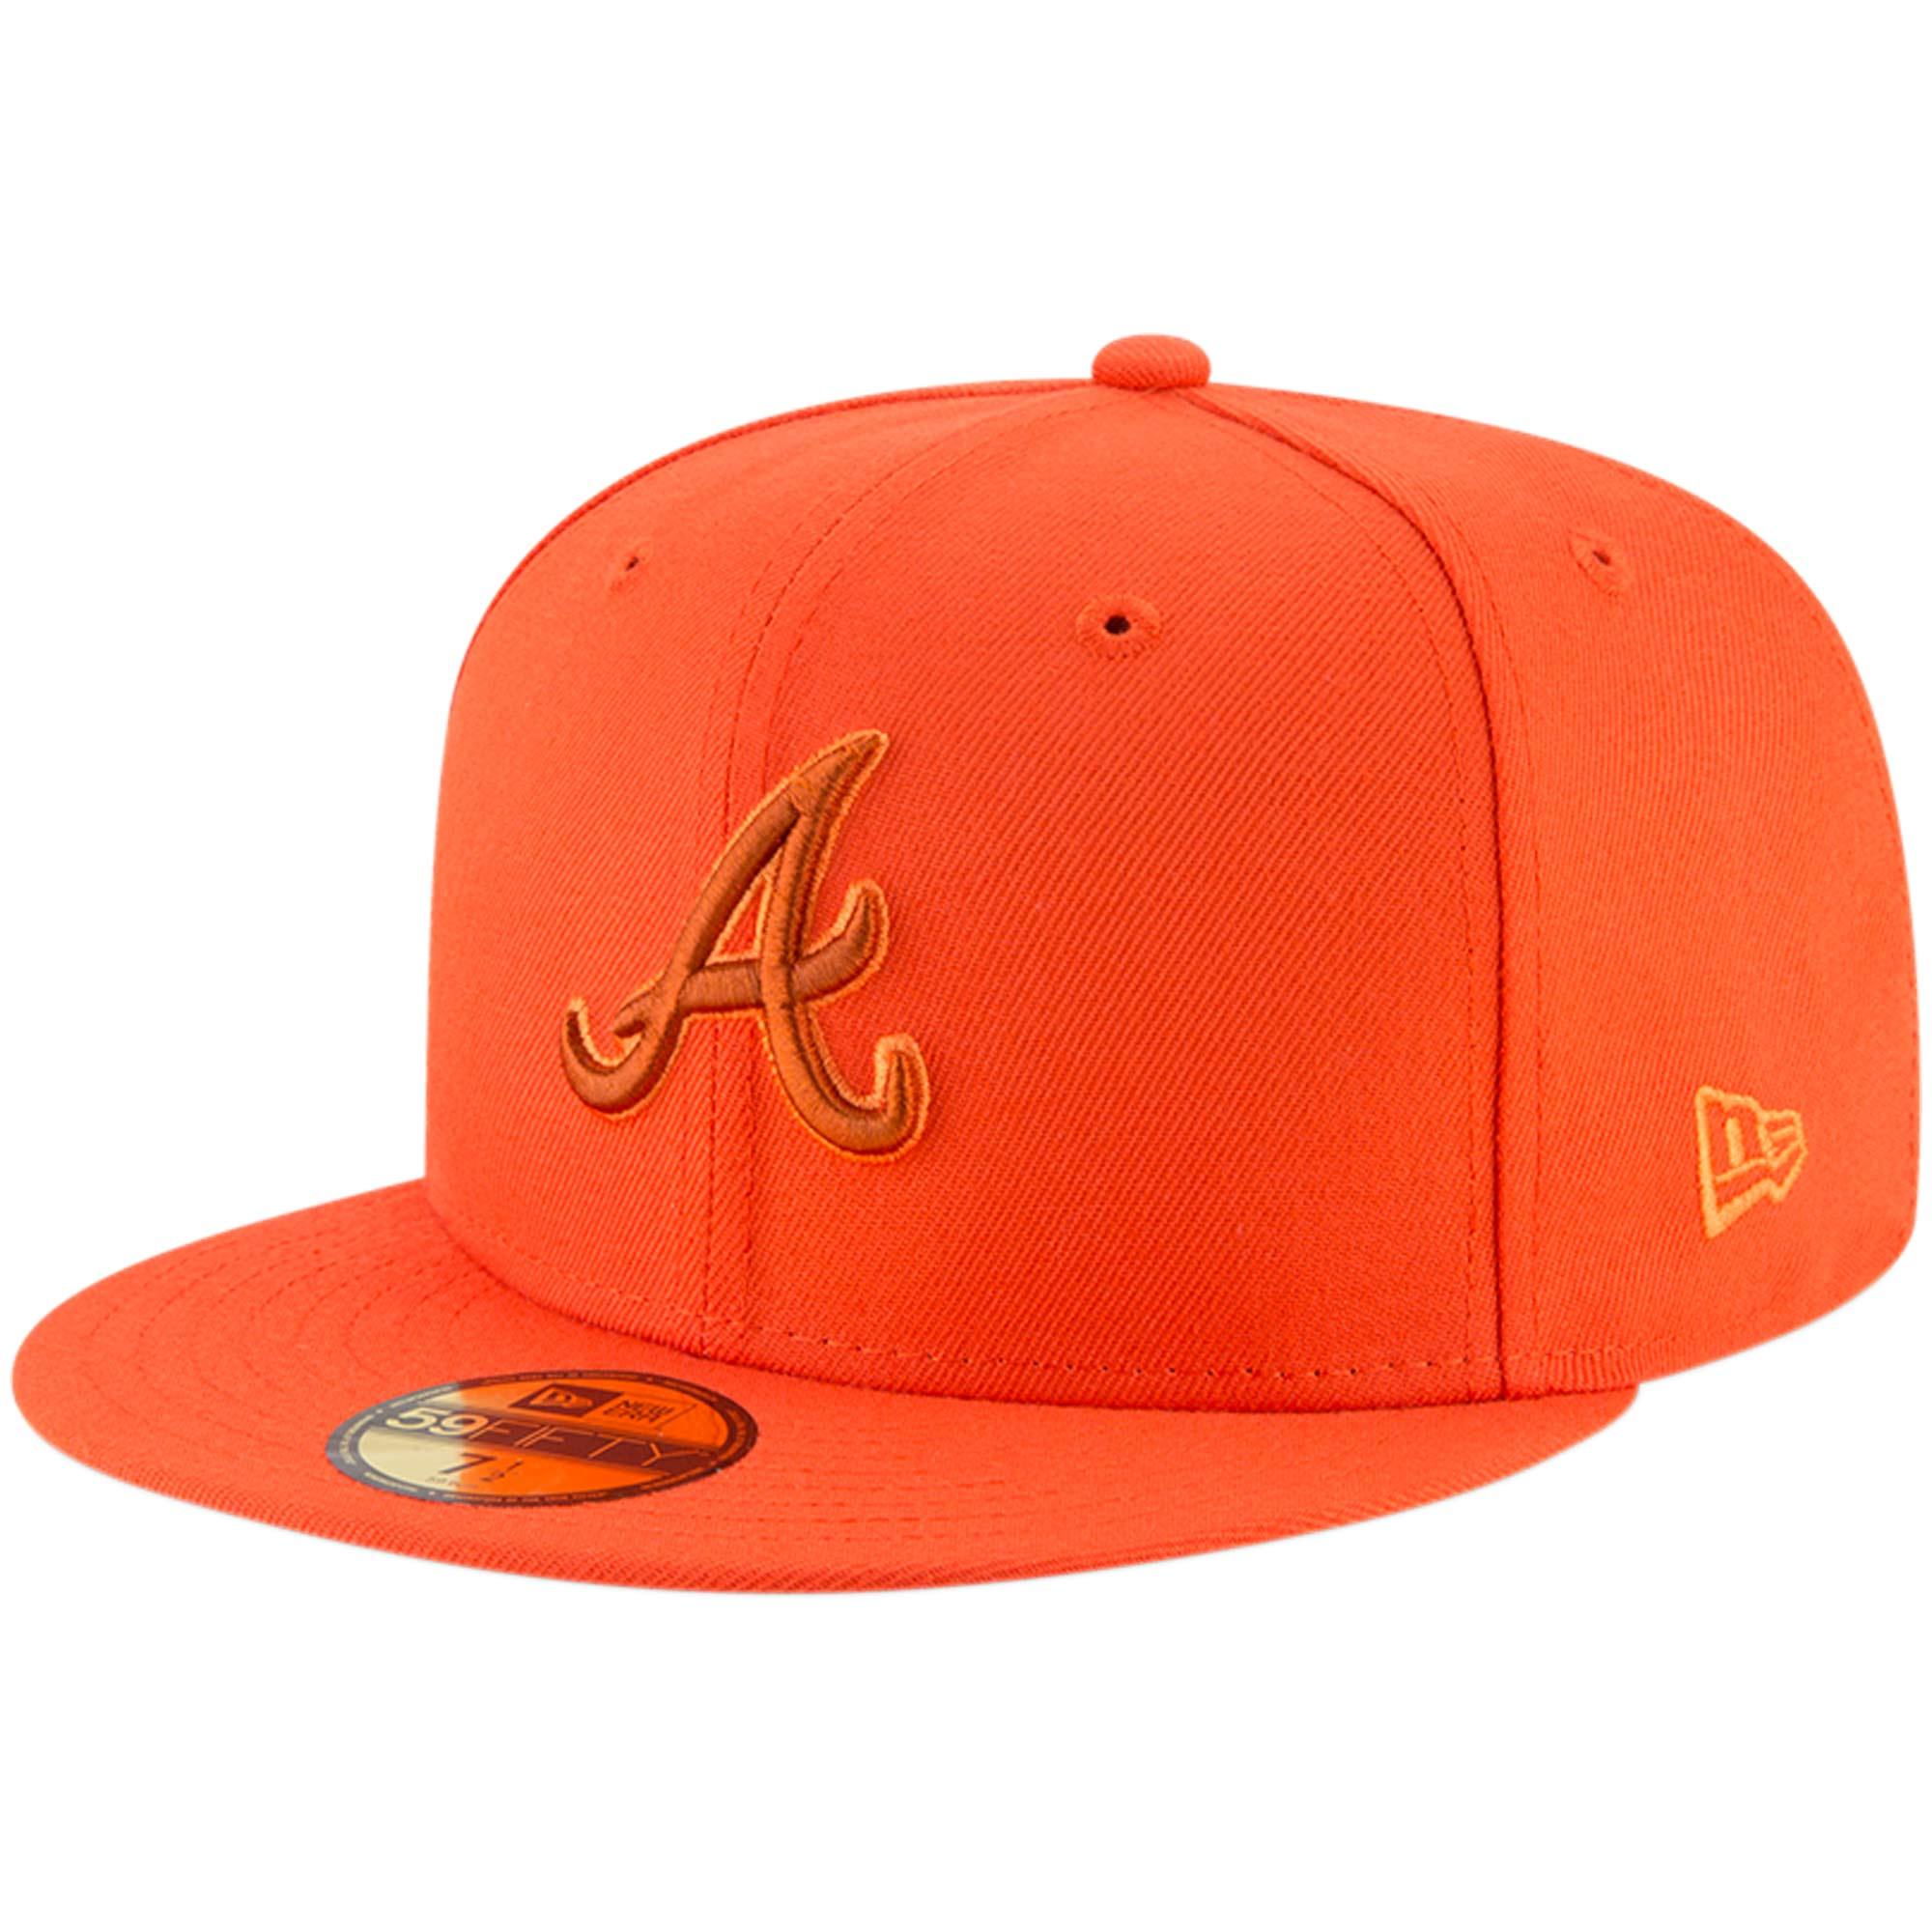 Atlanta Braves New Era League Pop 59FIFTY Fitted Hat - Orange